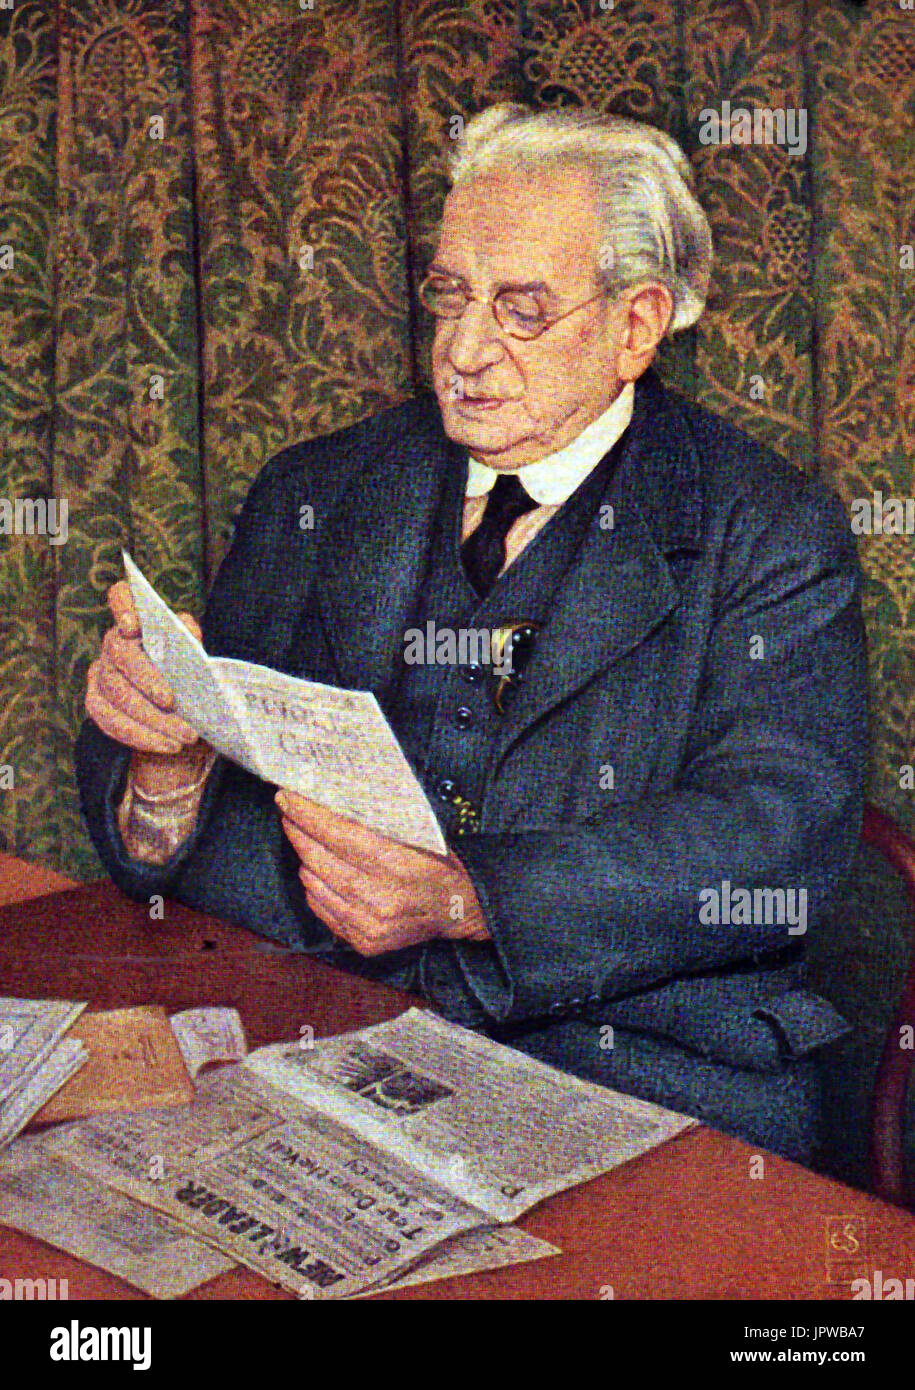 A portrait of Fred W Jowett MP of Bradford - Stock Image